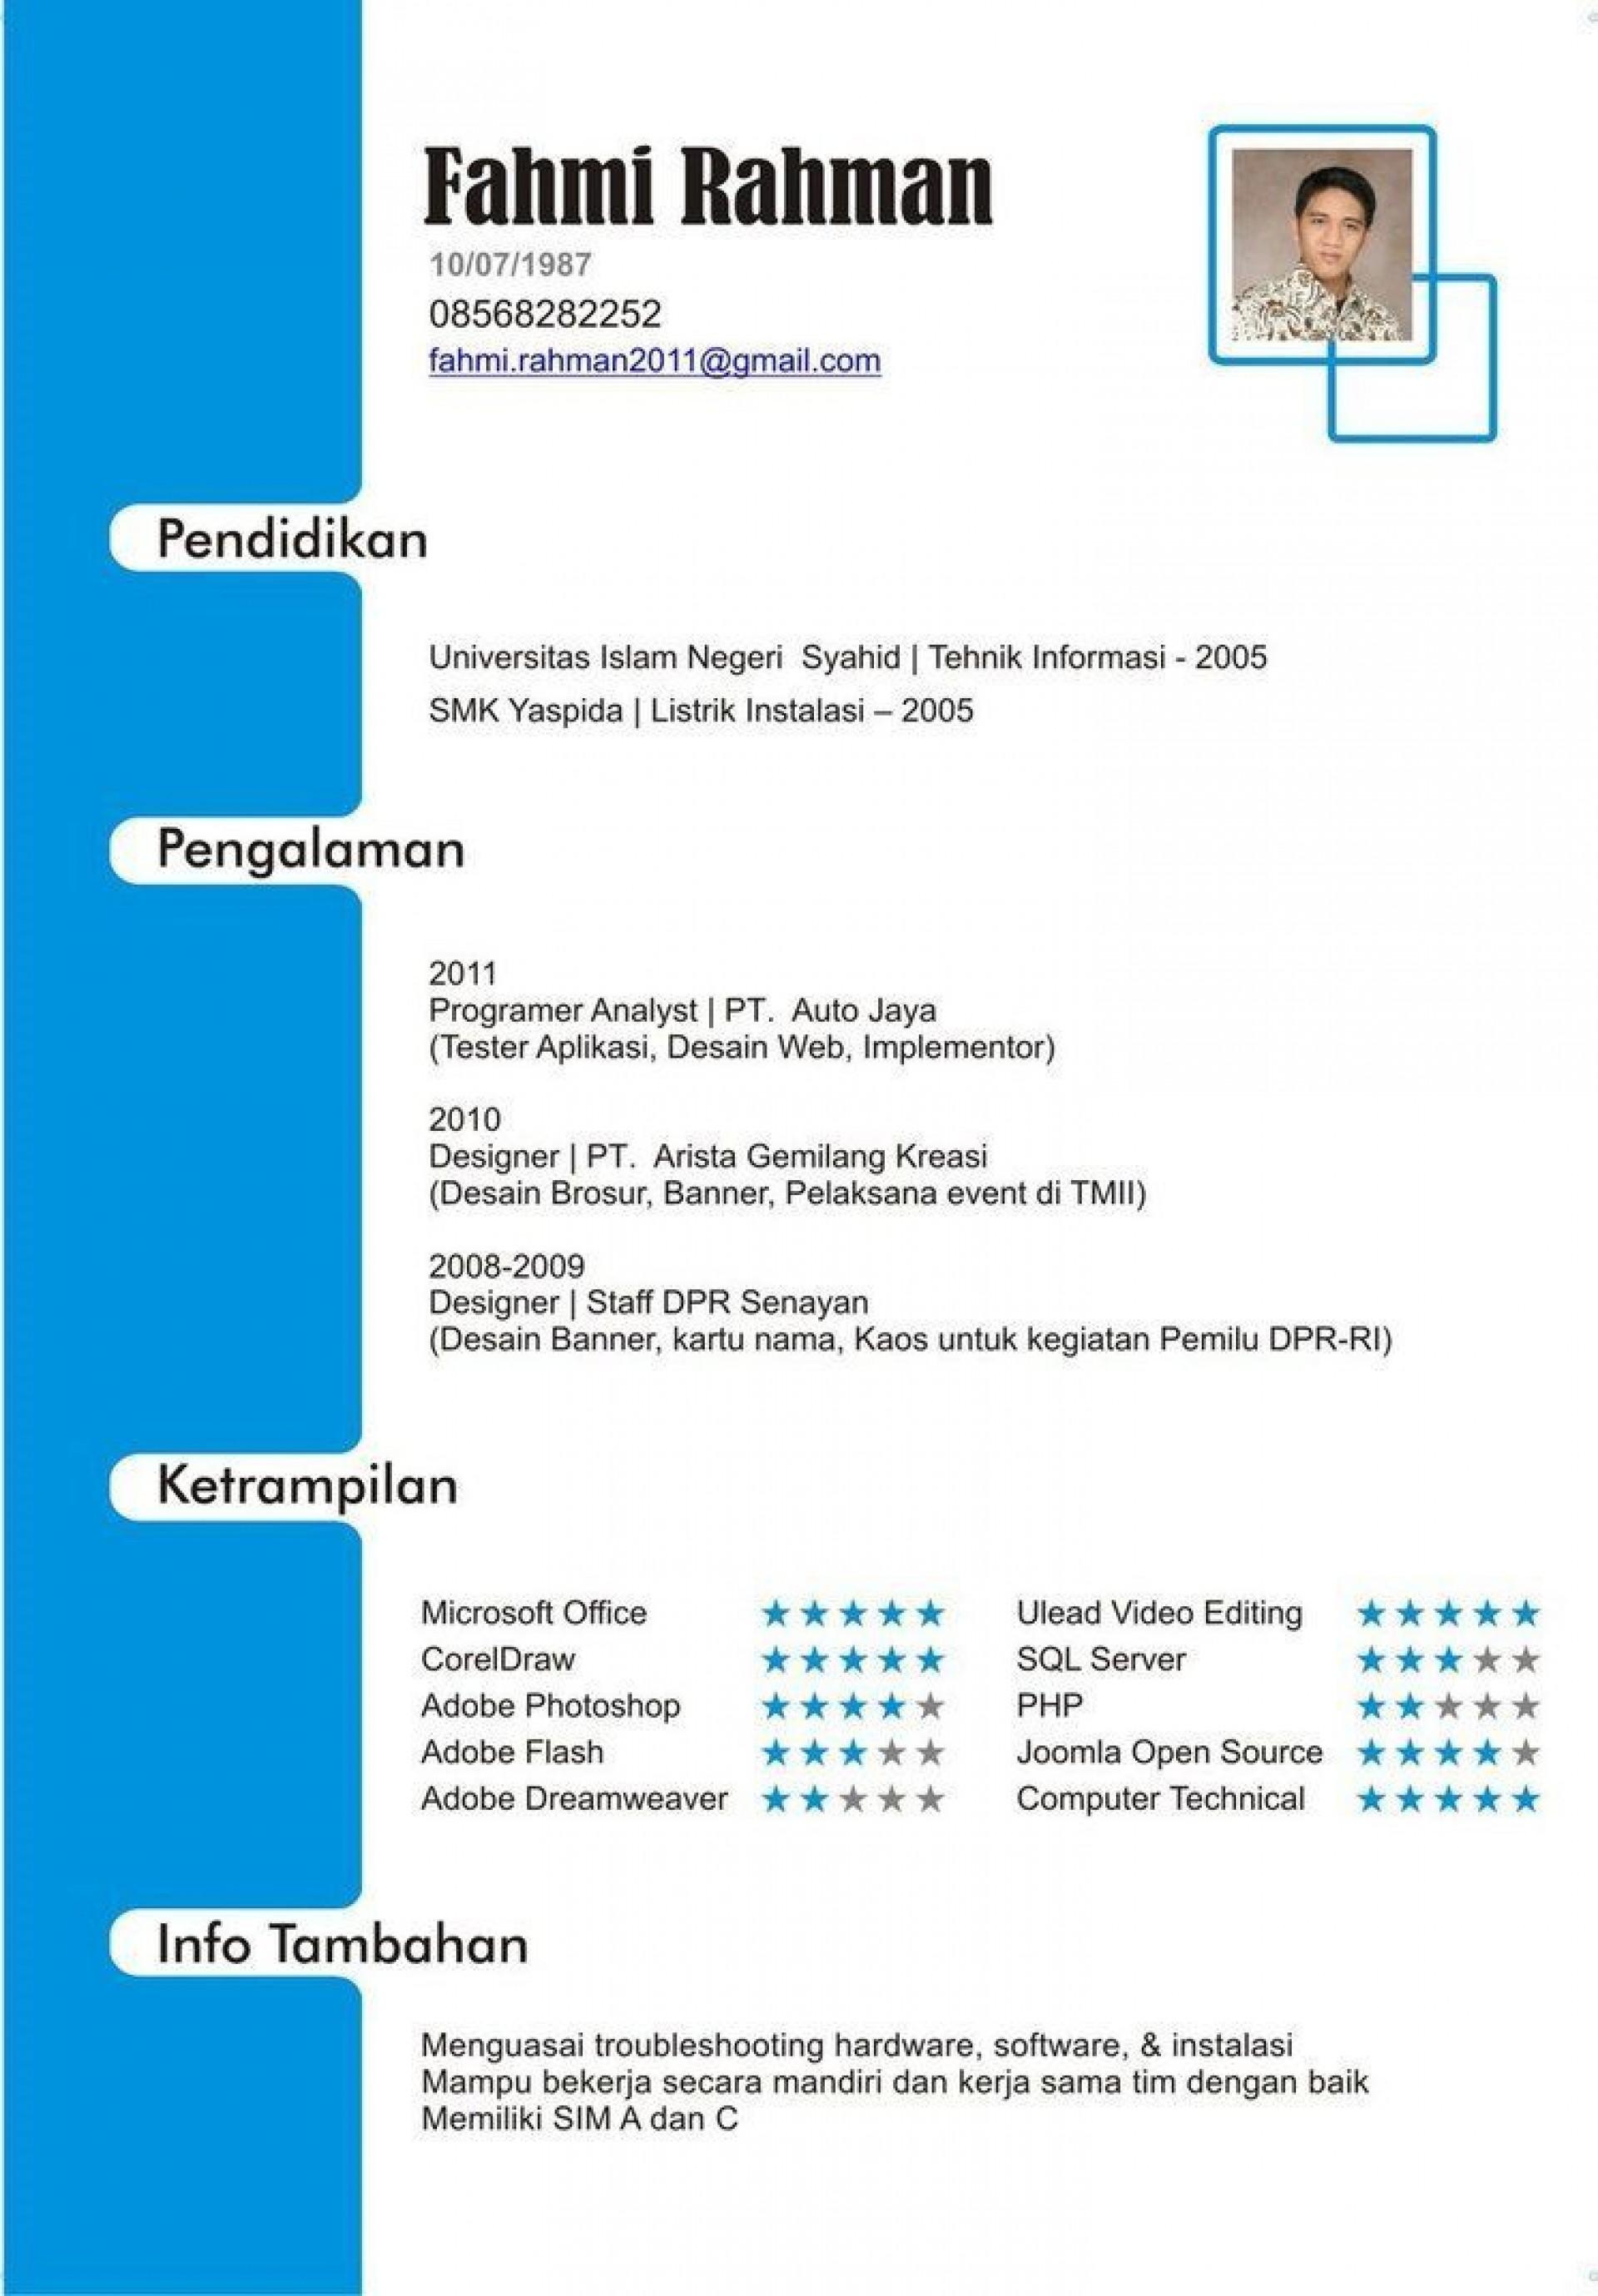 001 Magnificent Curriculum Vitae Template Free Design  Sample Pdf Download For Student Doc1920